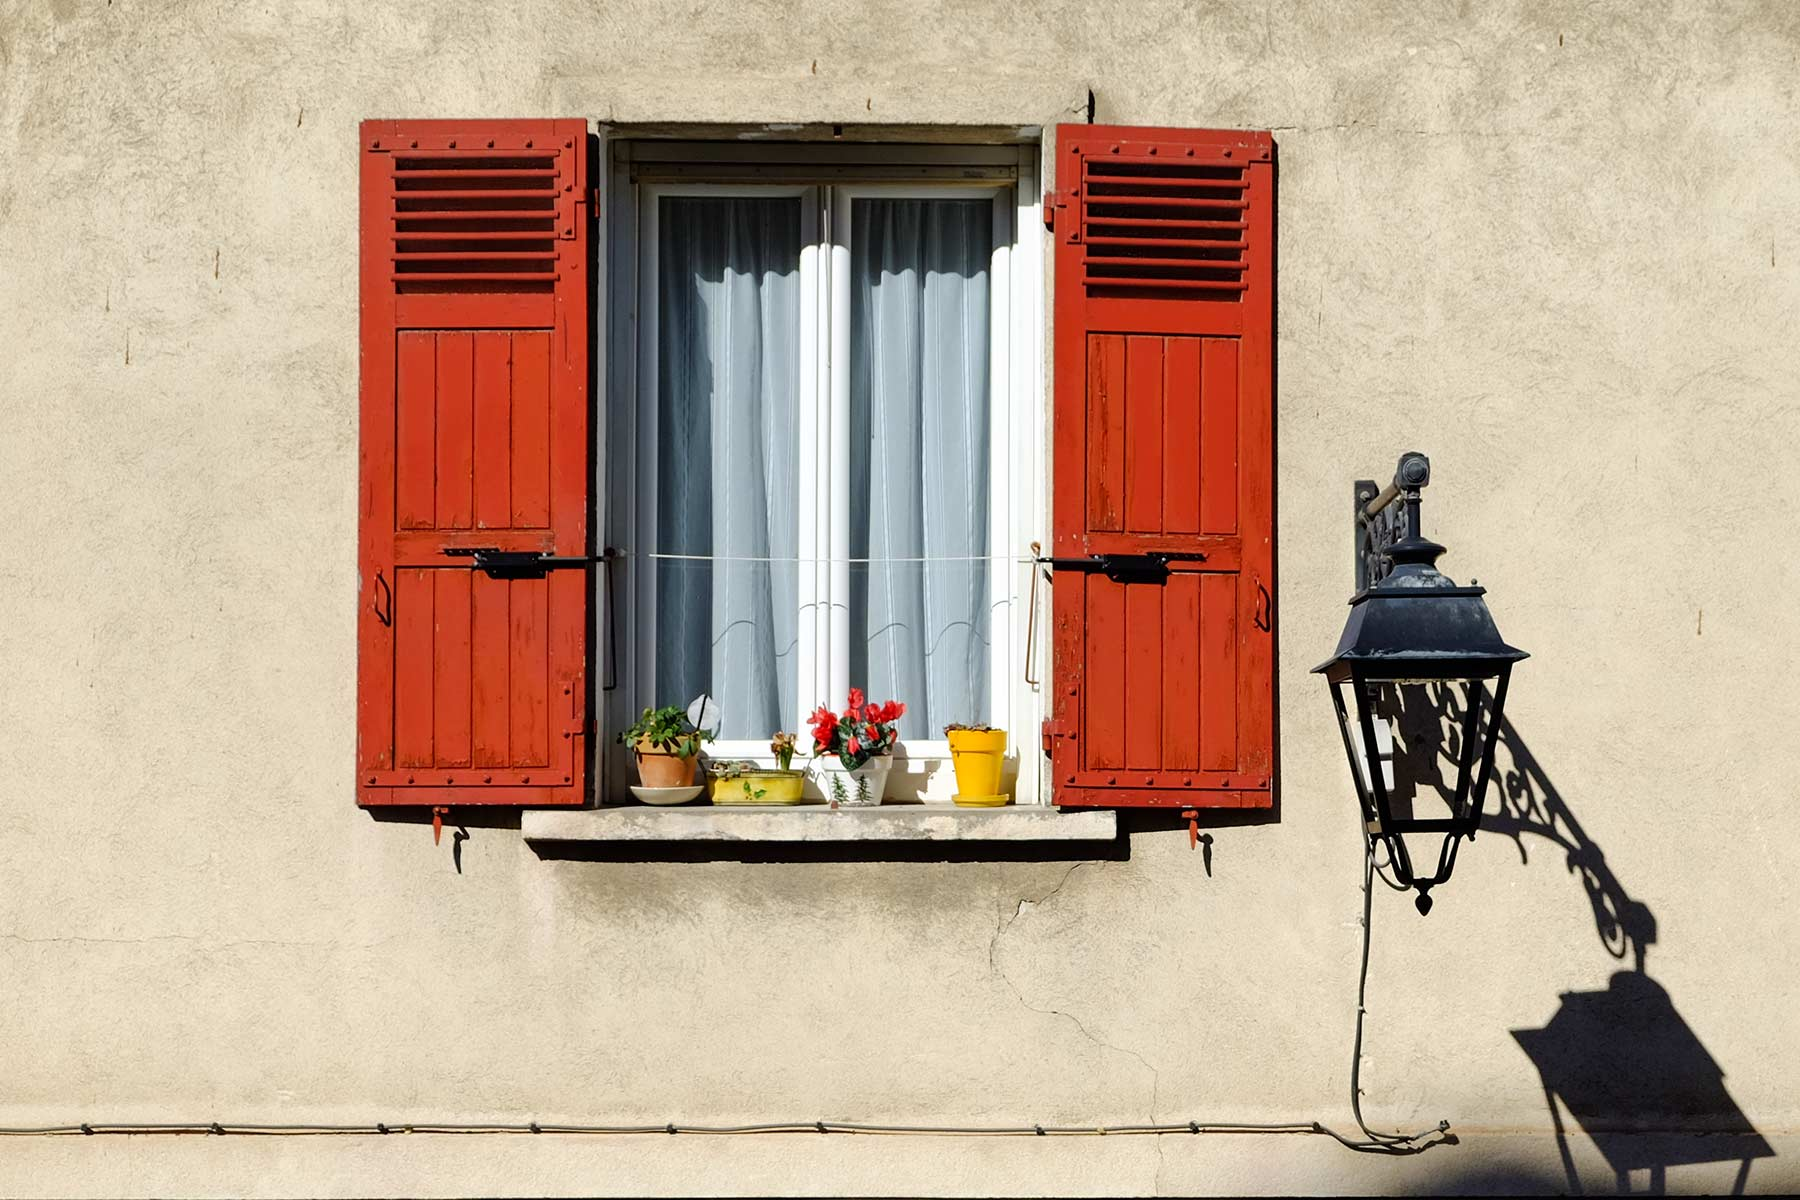 Fenster in Arles in der Provence, Frankreich